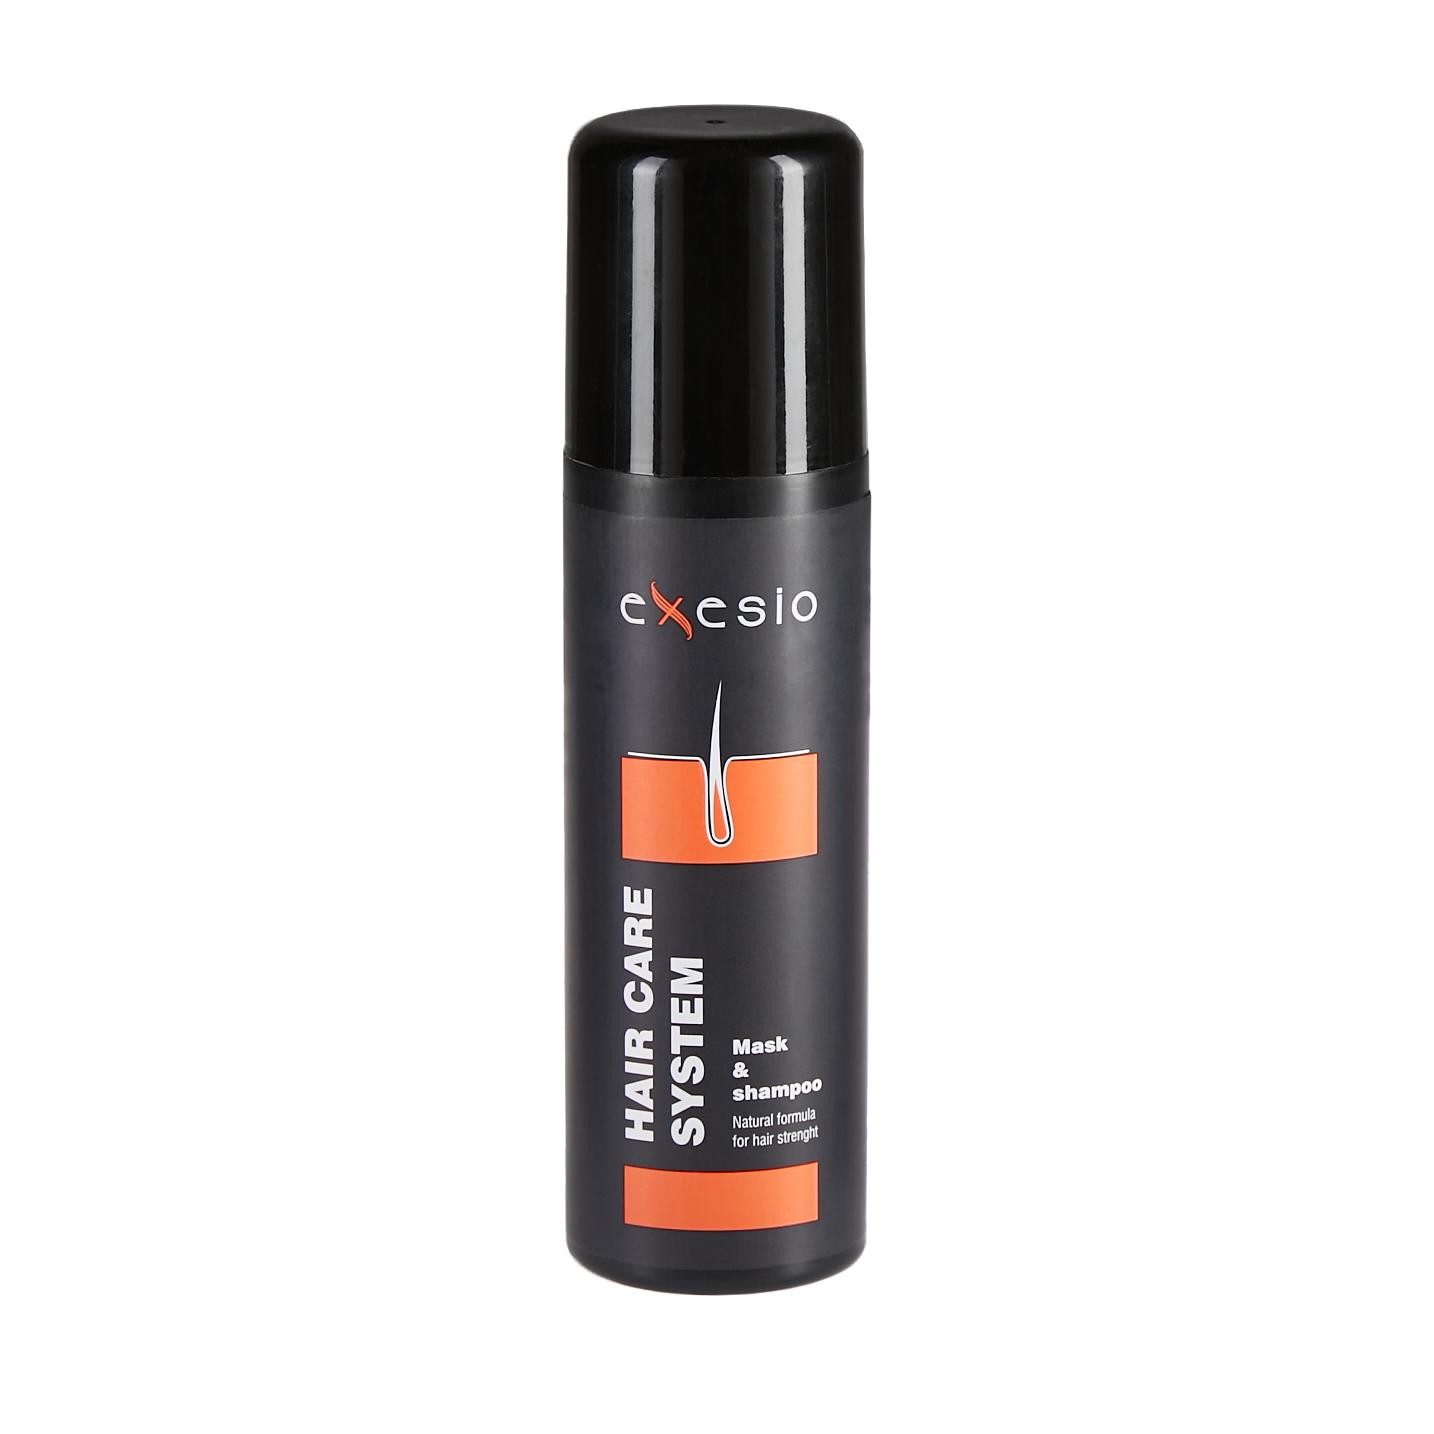 Exesio Shampoo 280 ml